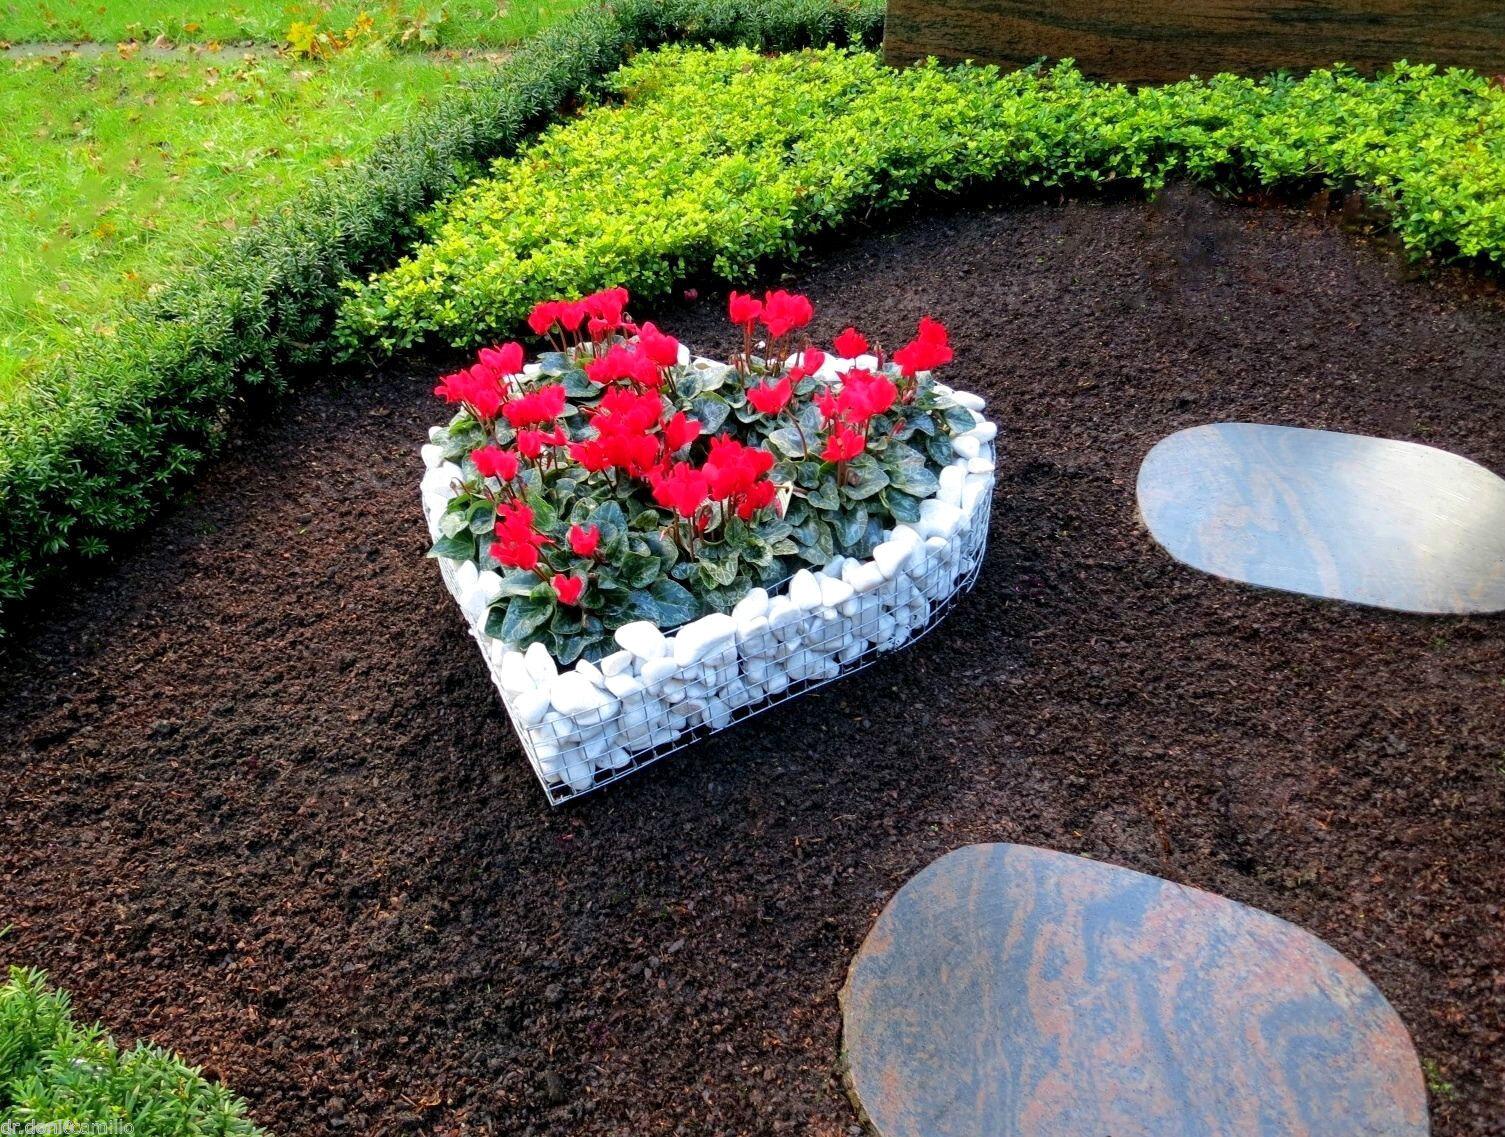 Tumba corazón 44x41x10 & grava tumba diseño tumba corazón tumba cásCochea Heart Ángel Flores